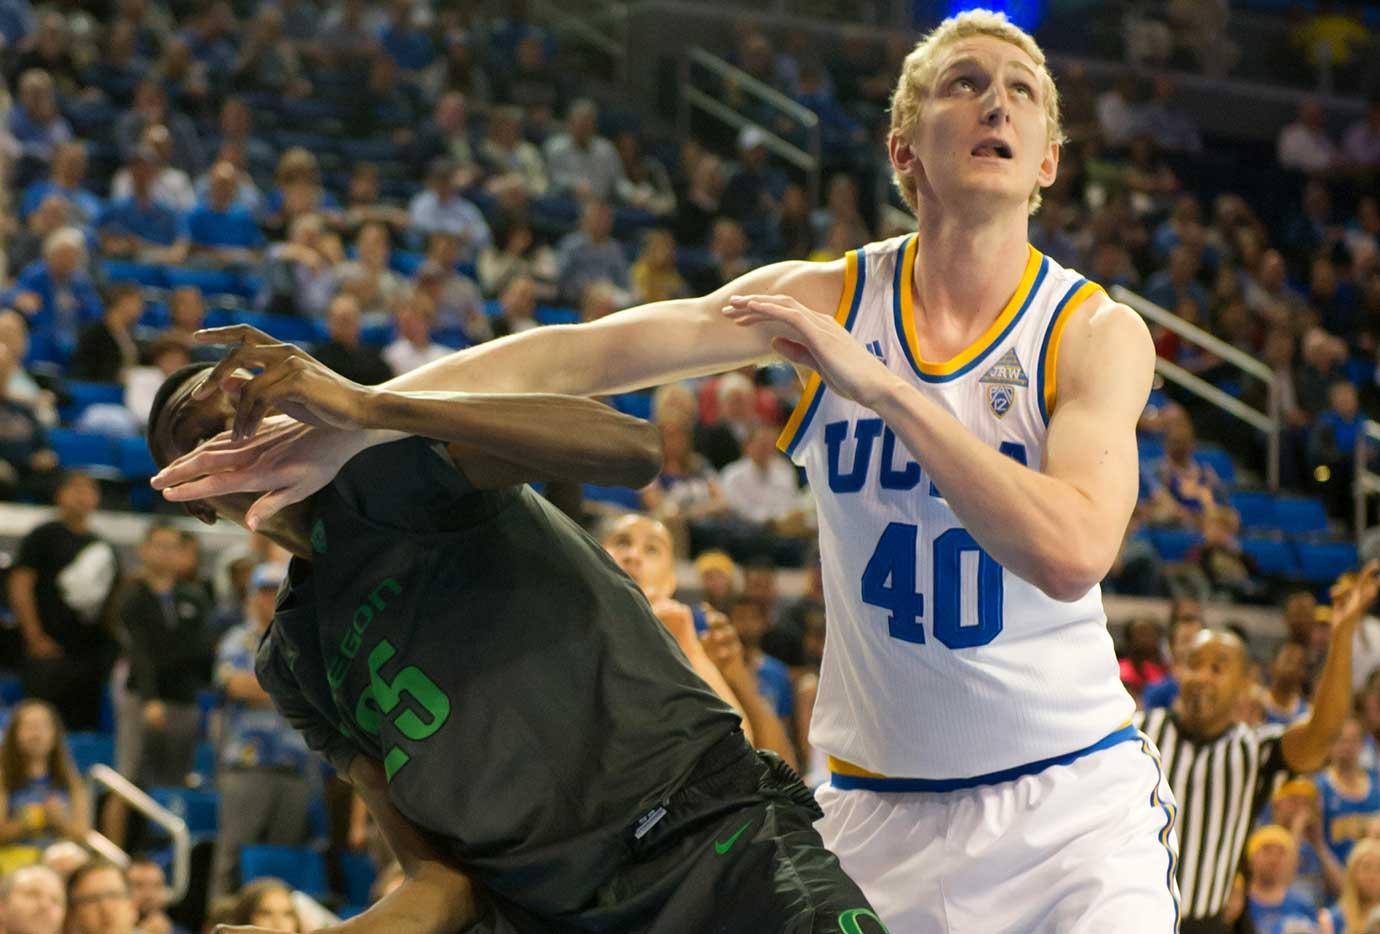 UCLA Bruins center Thomas Welsh fights for position against Oregon's Chris Boucher.